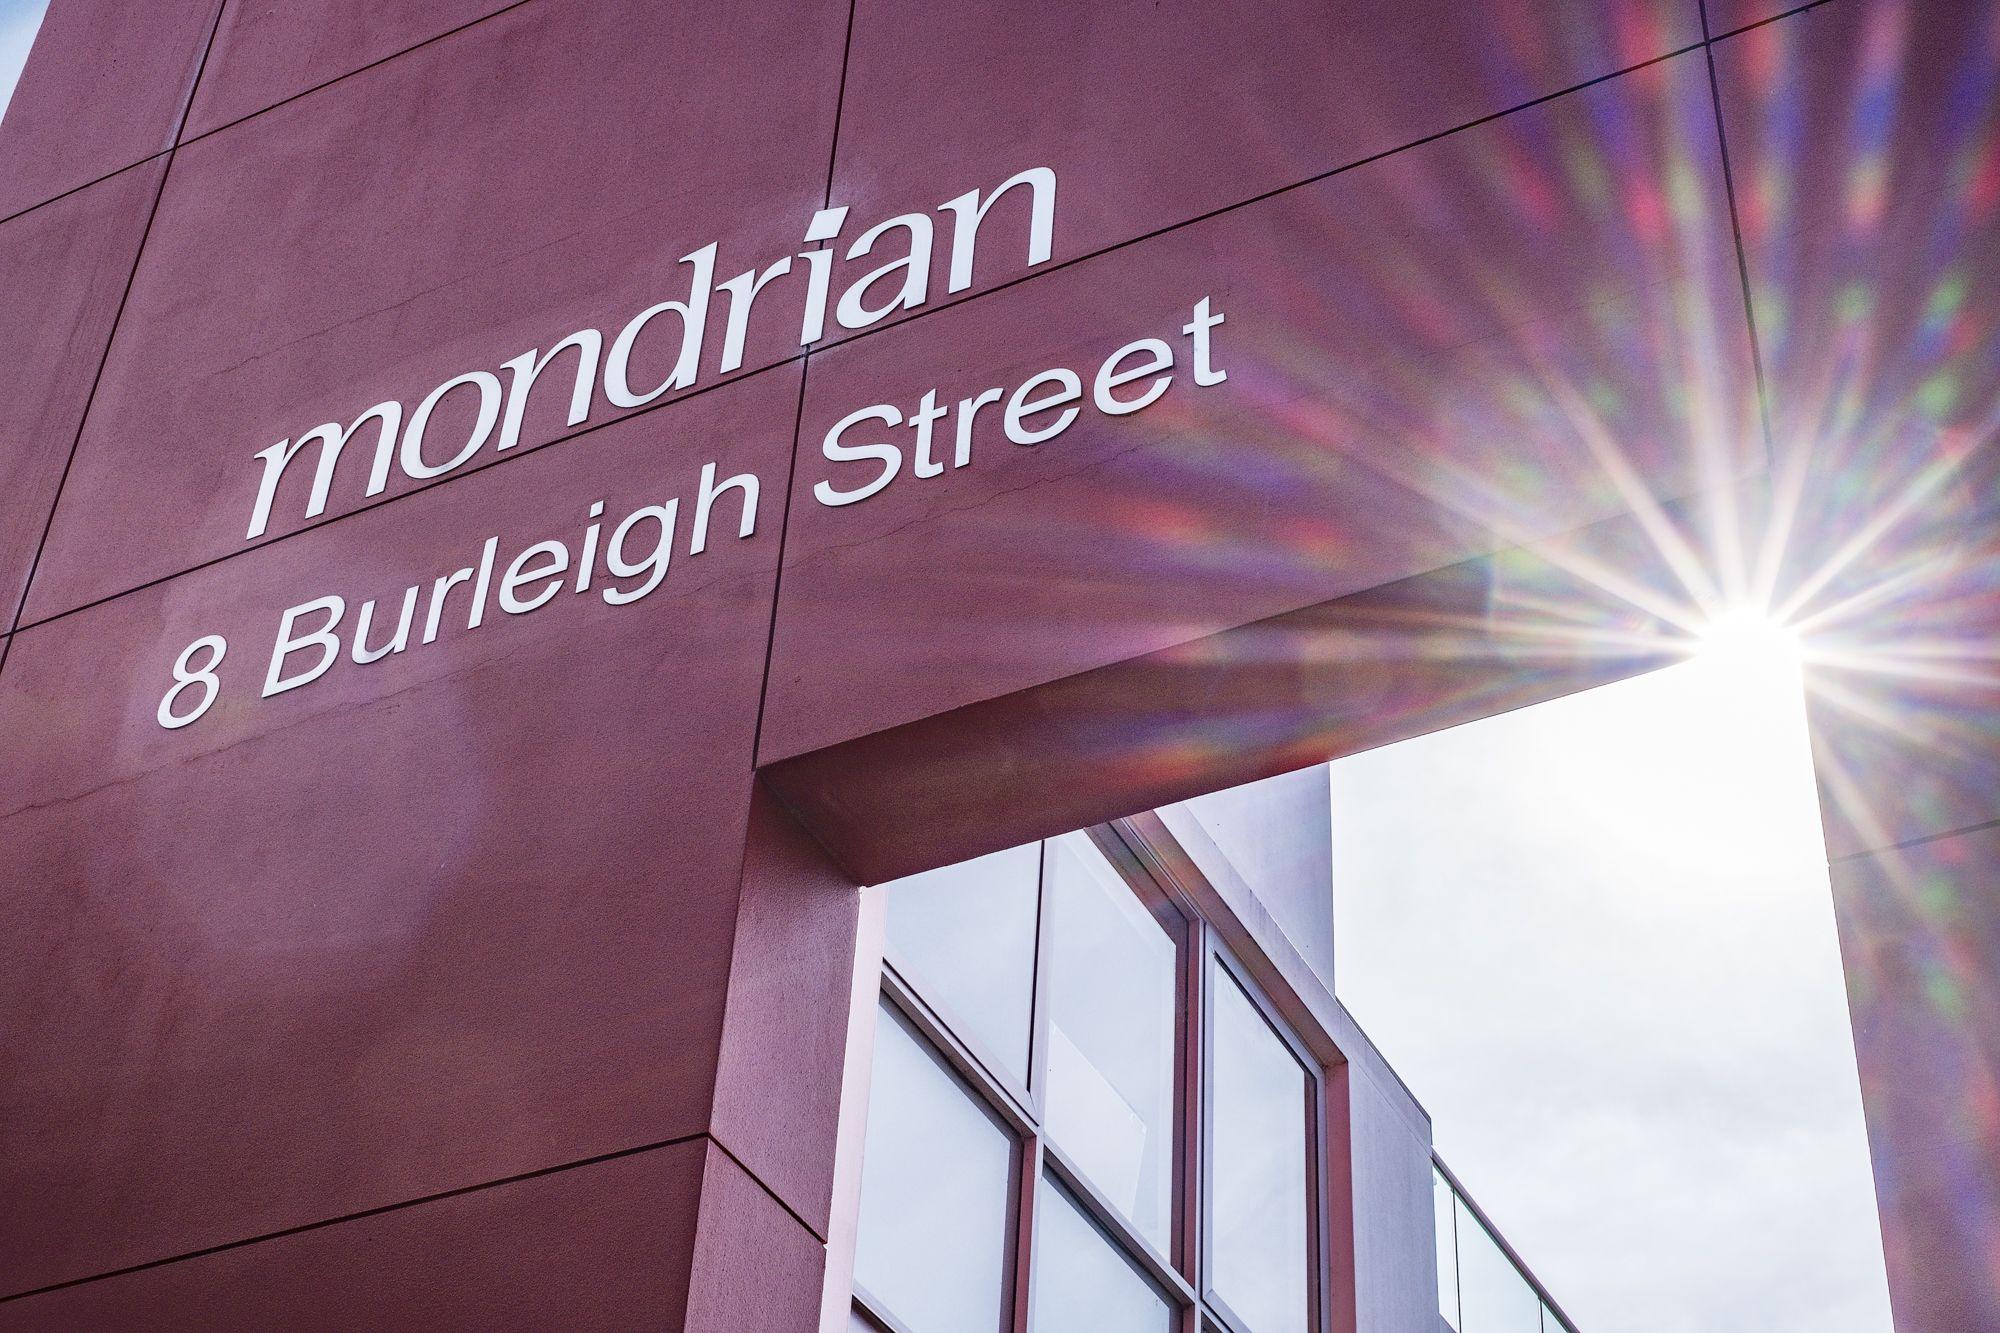 207/2-8 Burleigh Street Lindfield 2070